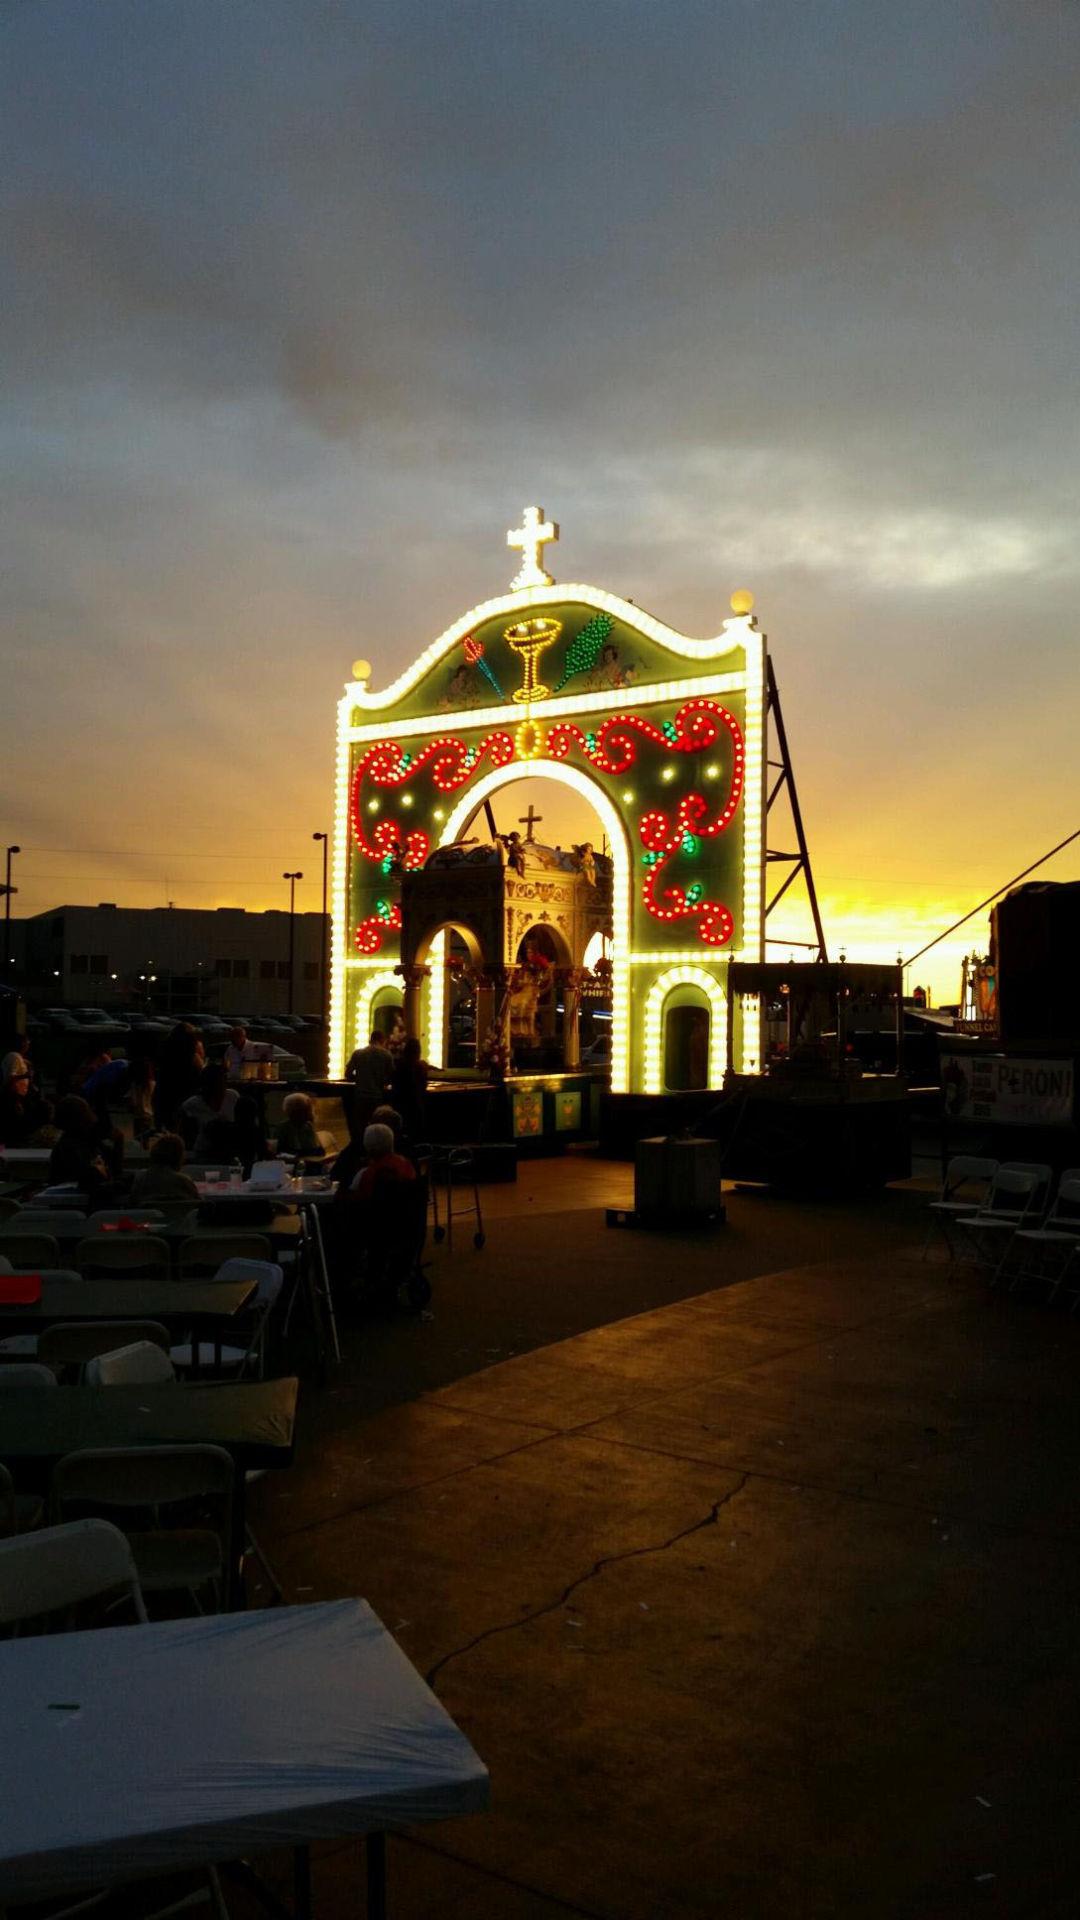 lighting of arch kicks off santa lucia festival at lewis clark landing omaha metro. Black Bedroom Furniture Sets. Home Design Ideas